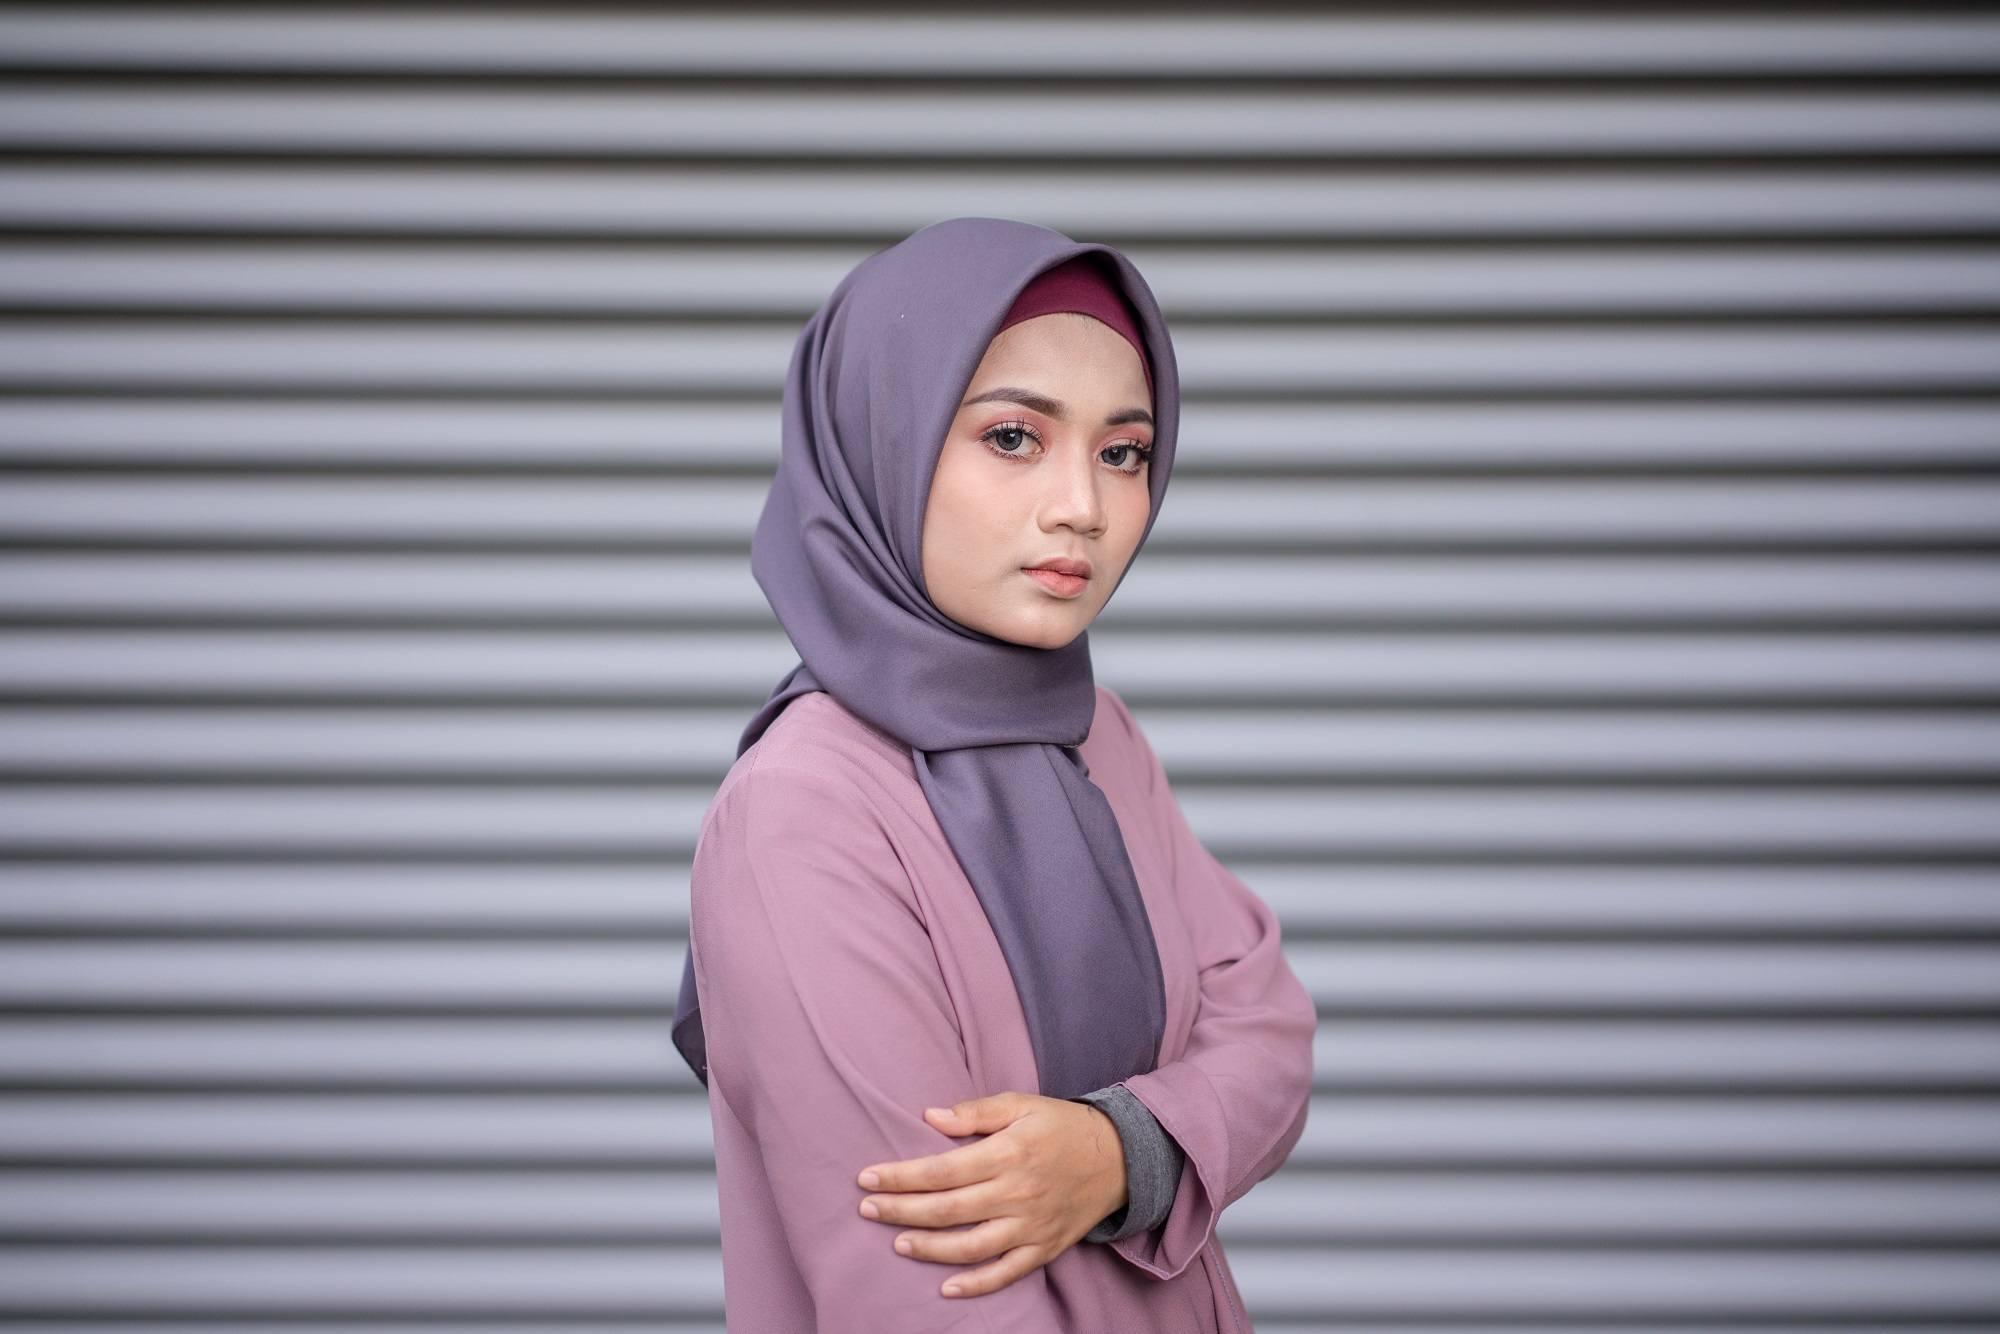 Wanita Asia memakai hijab segi empat formal berwarna ungu